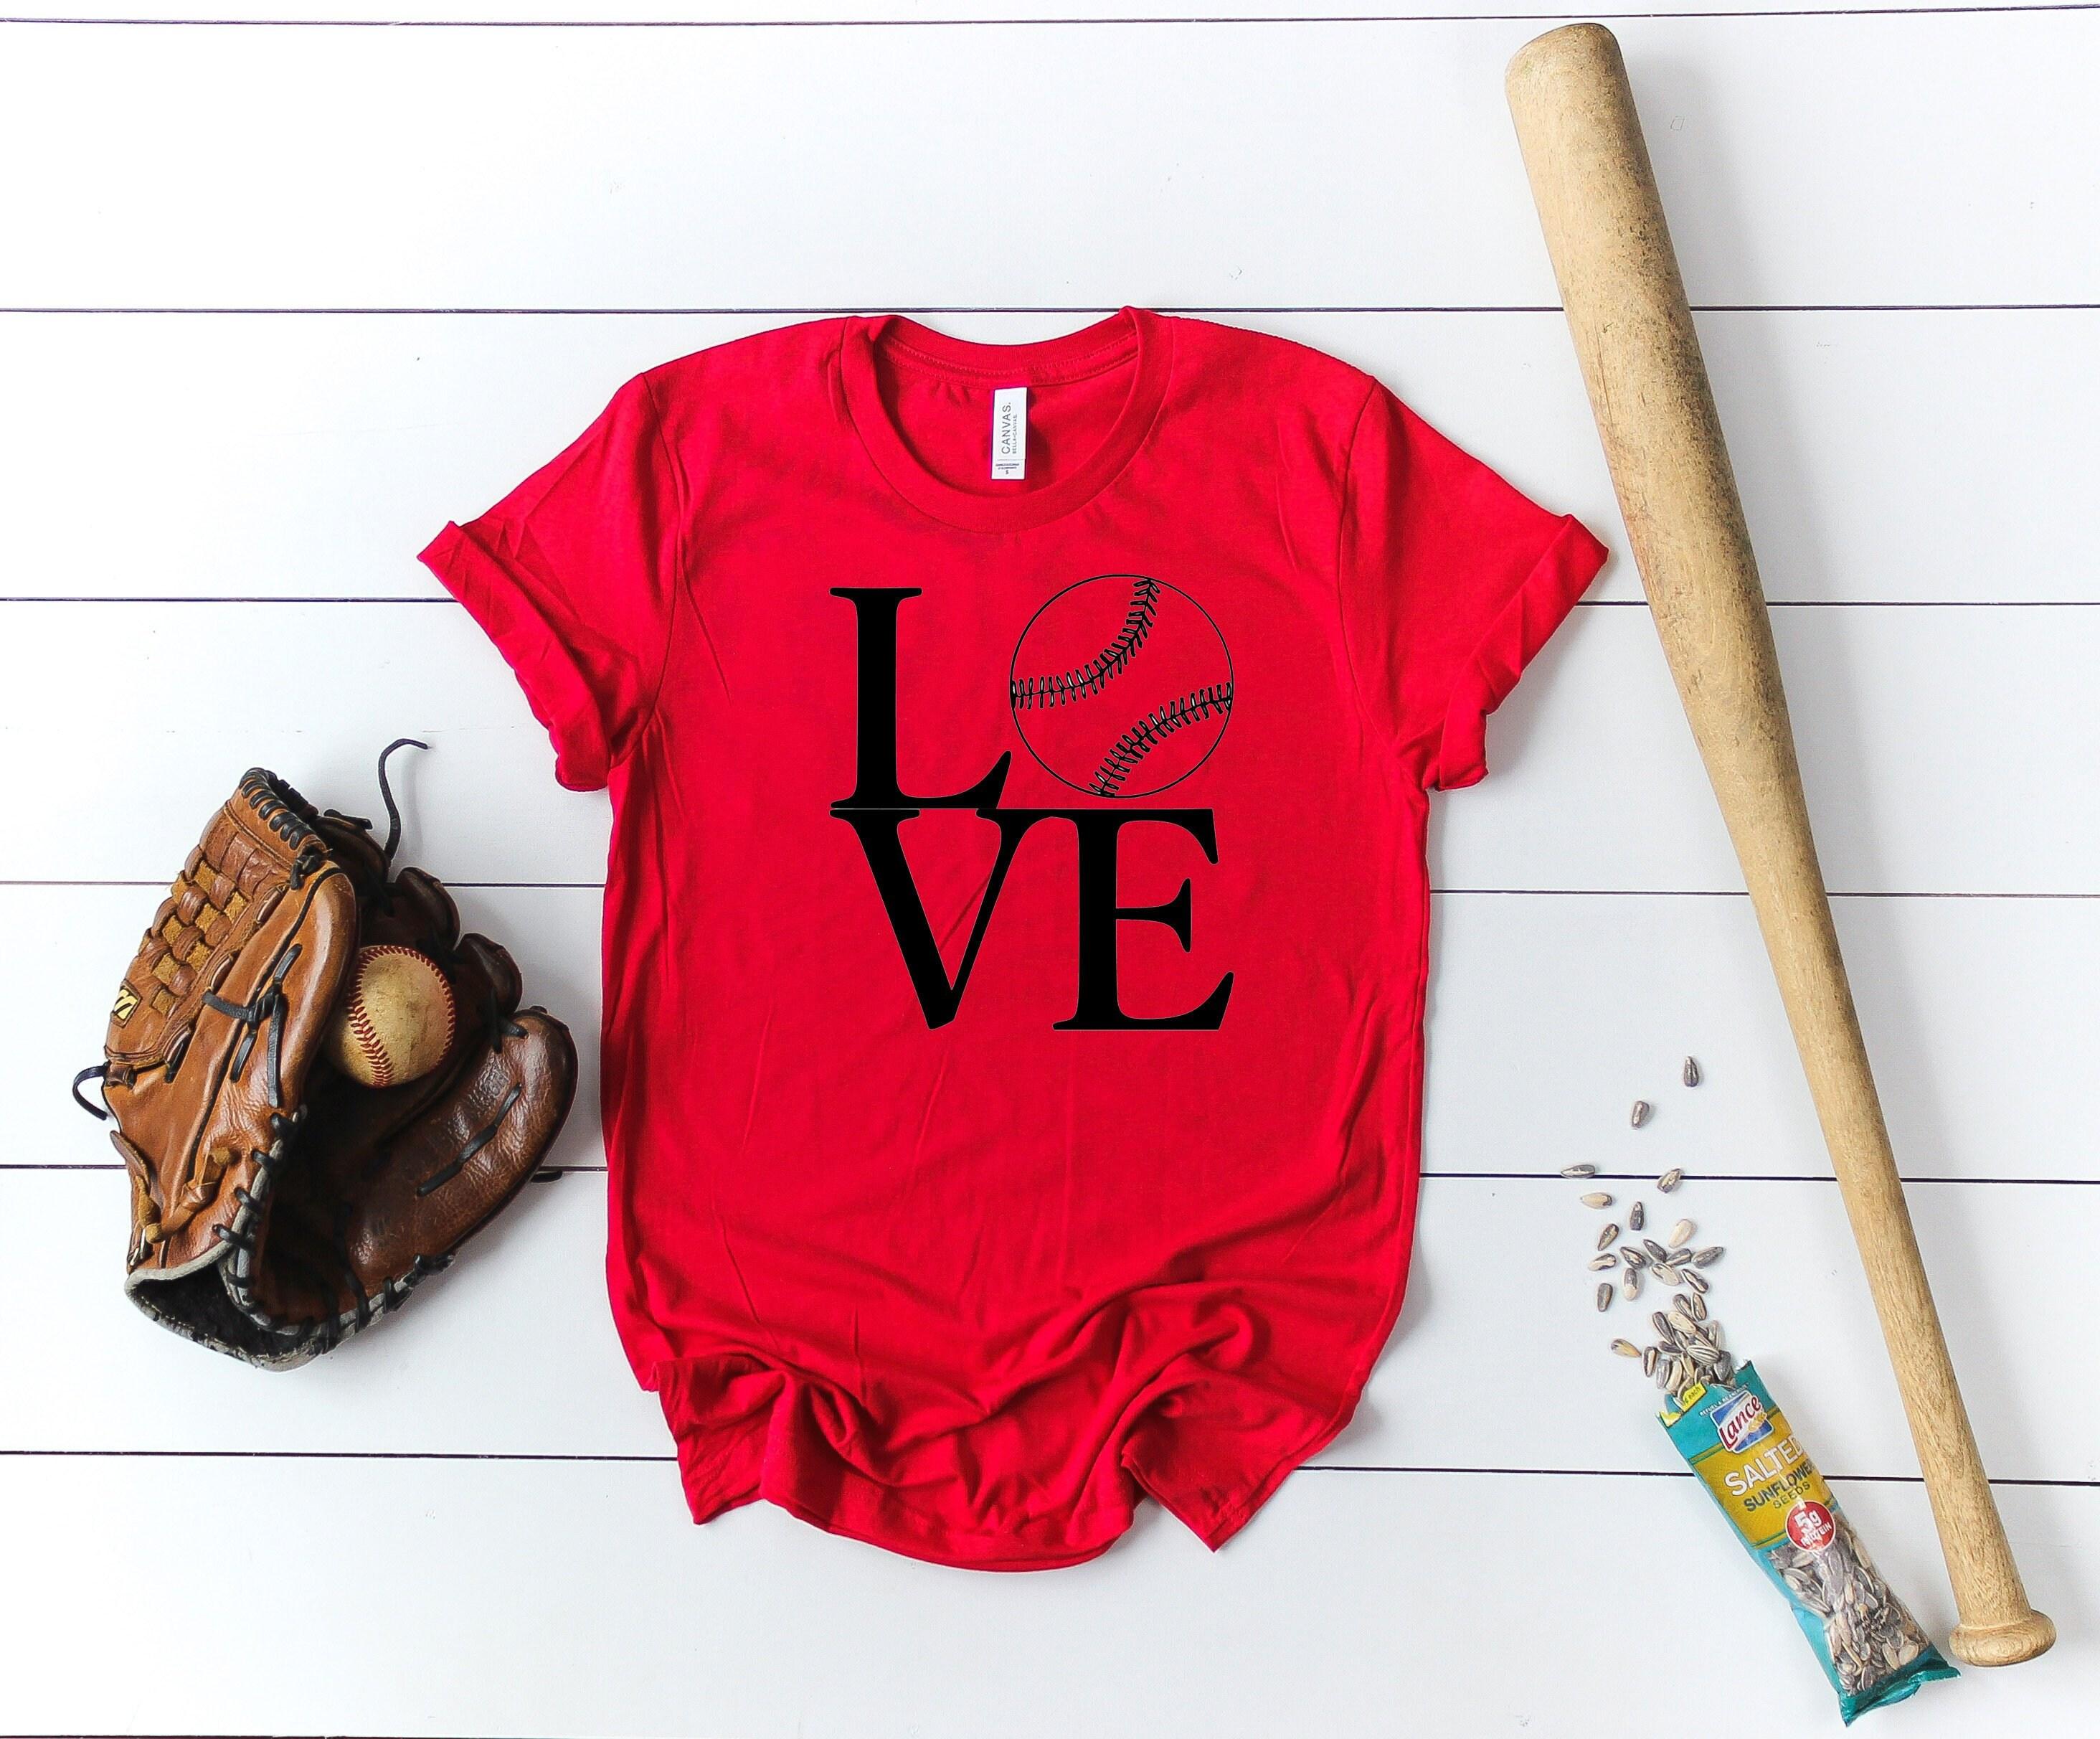 b12887a5b Softball Love Short Sleeved Shirt - Baseball Love Short Sleeve Tee